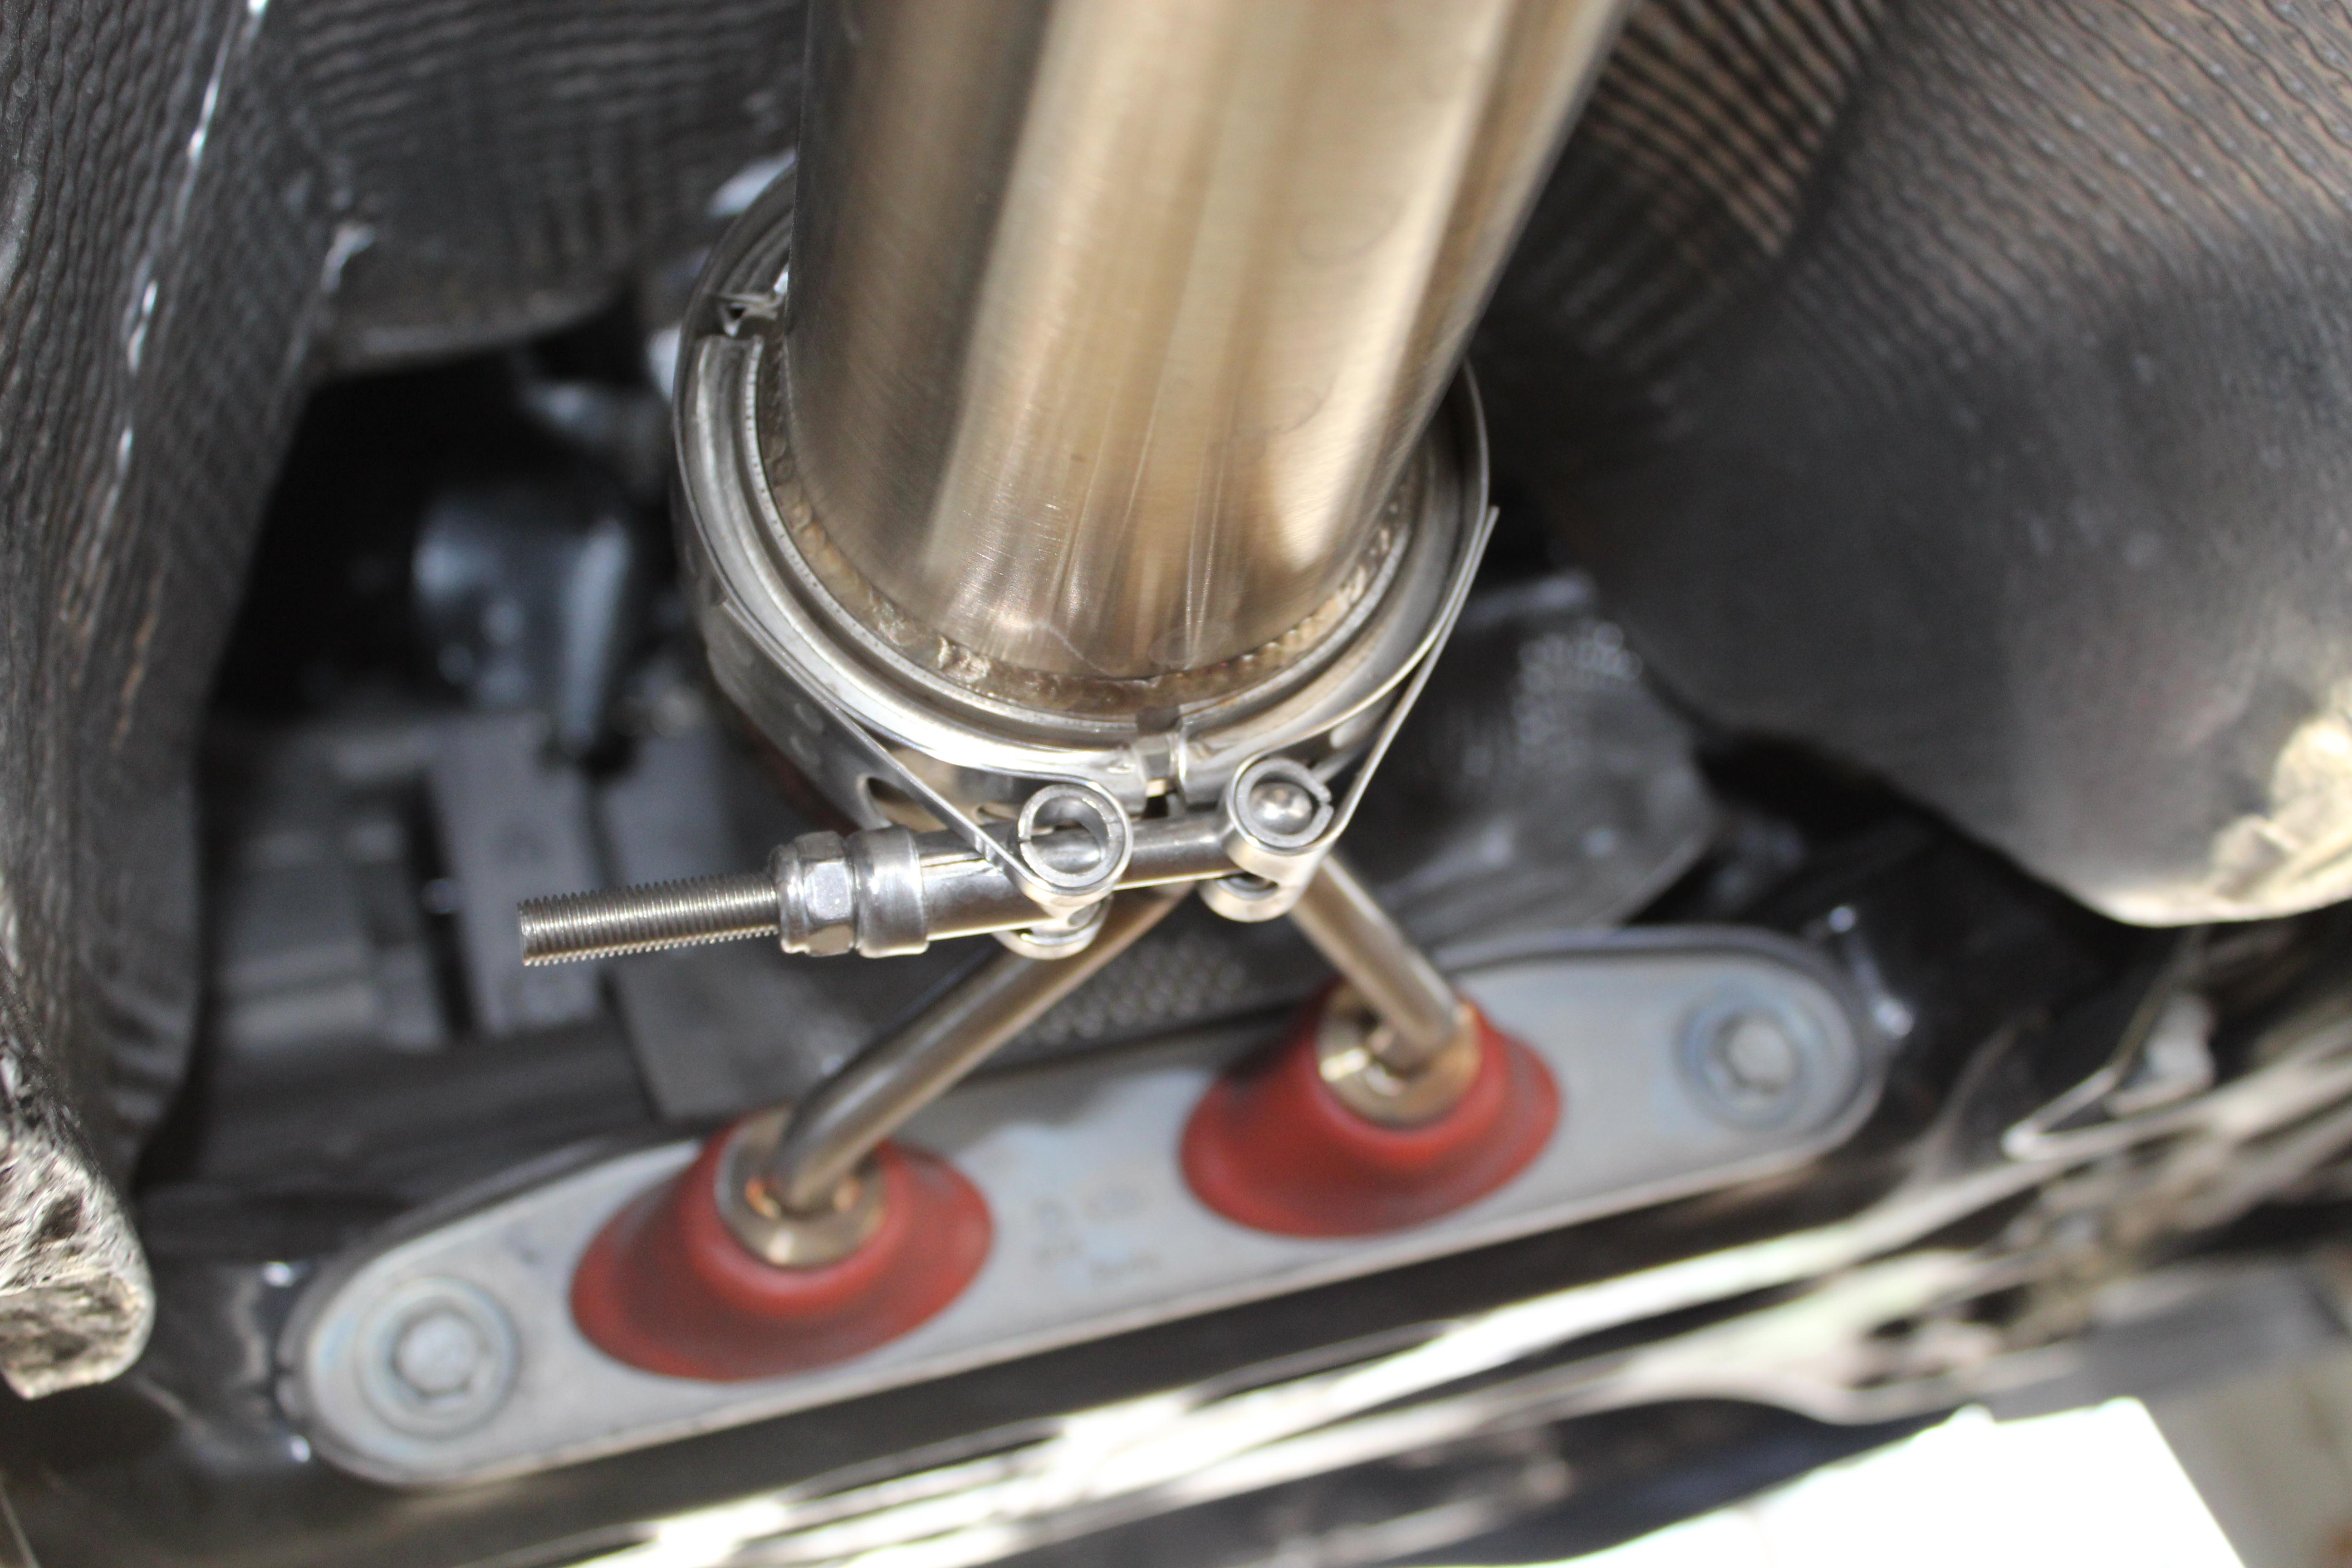 2015 - 2019 MK7 / MK 7.5 - VW Golf GTI / TSI Downpipe Catless